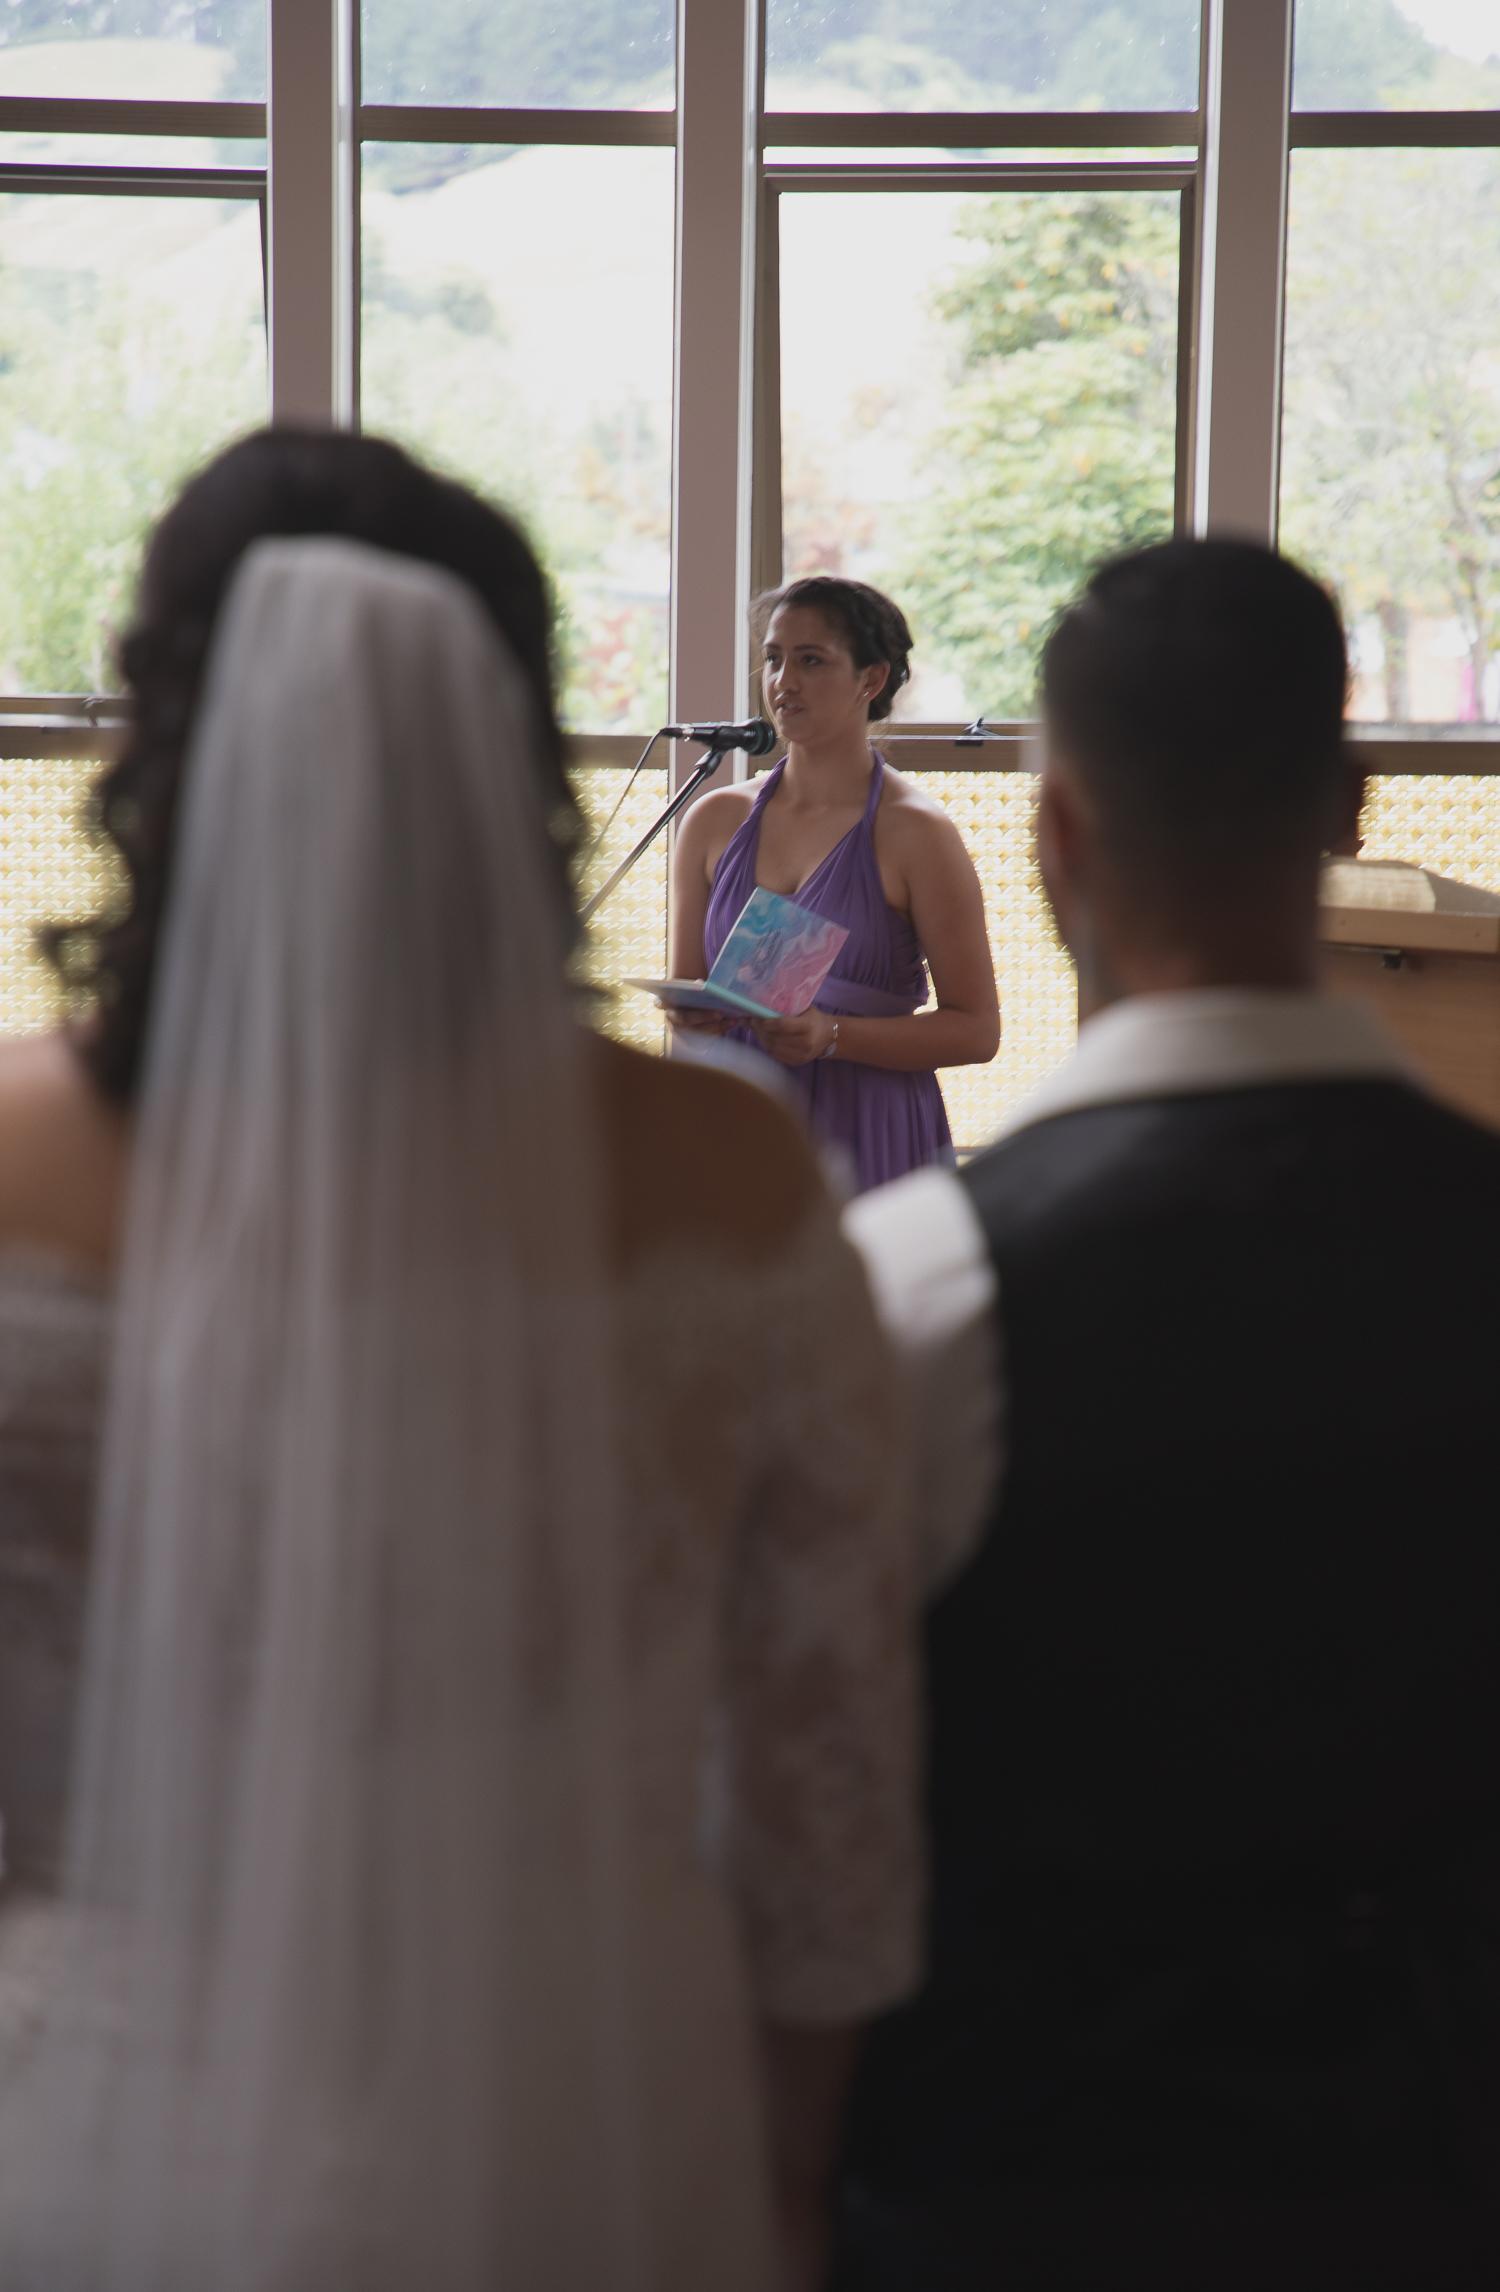 bridesmaid singing as bride and groom watch on